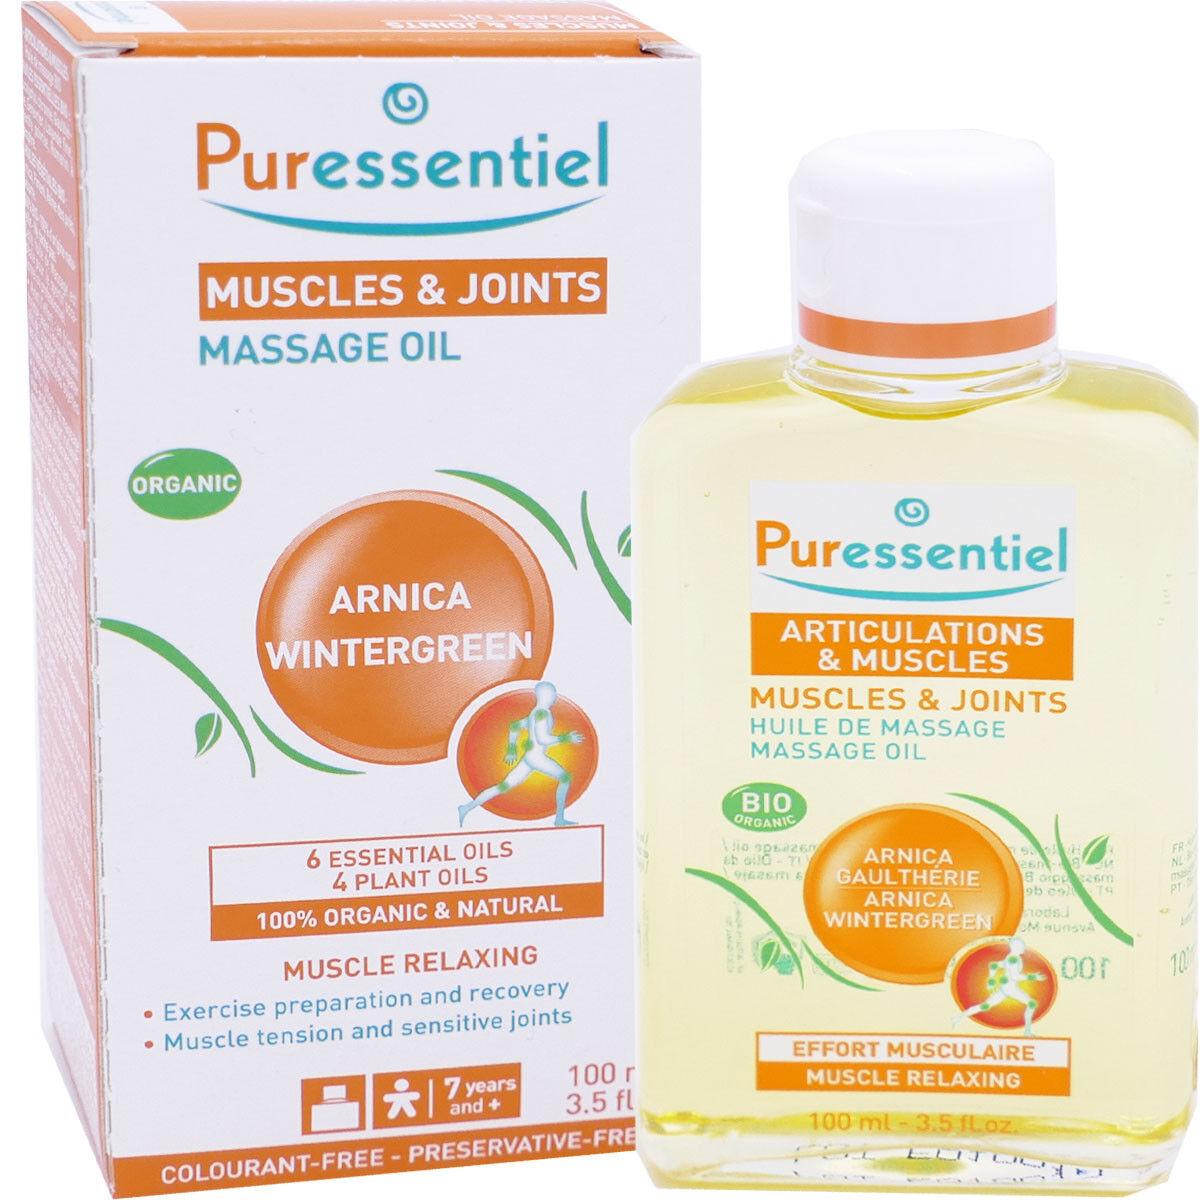 Puressentiel huile de massage articulations & muscles 100ml